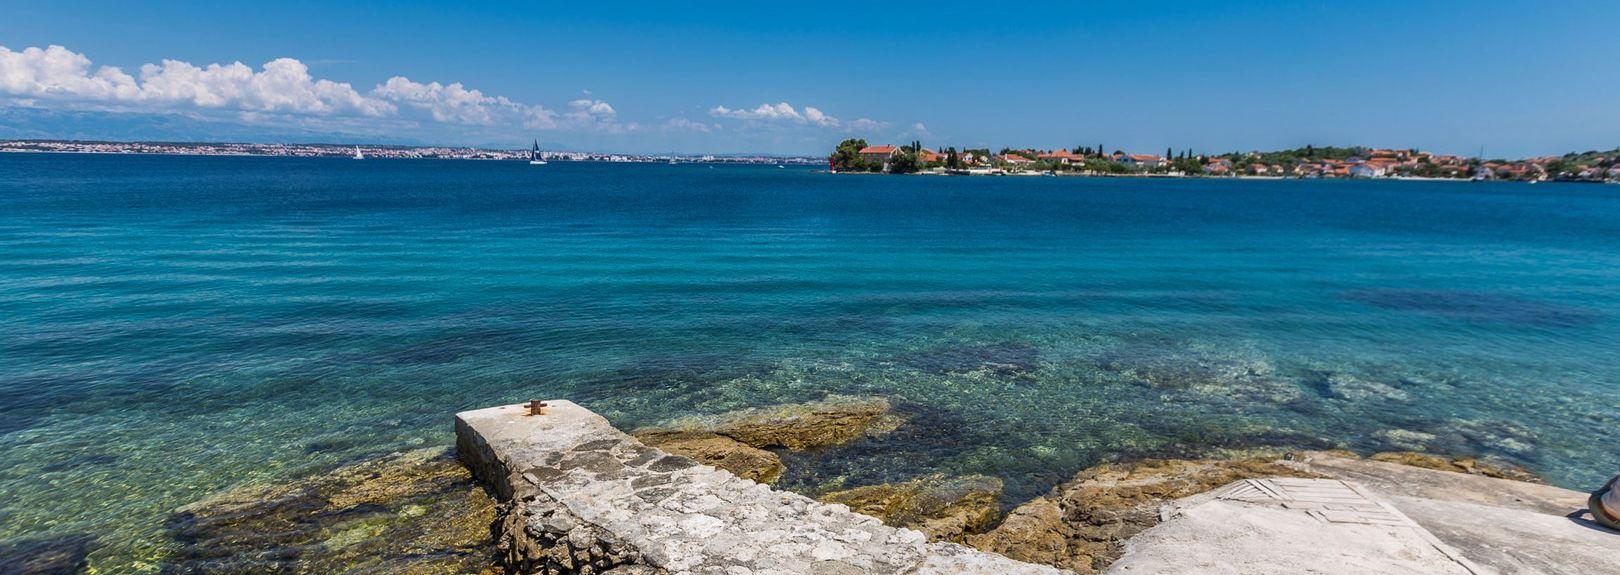 Luka, Sali, Zadar, Croácia